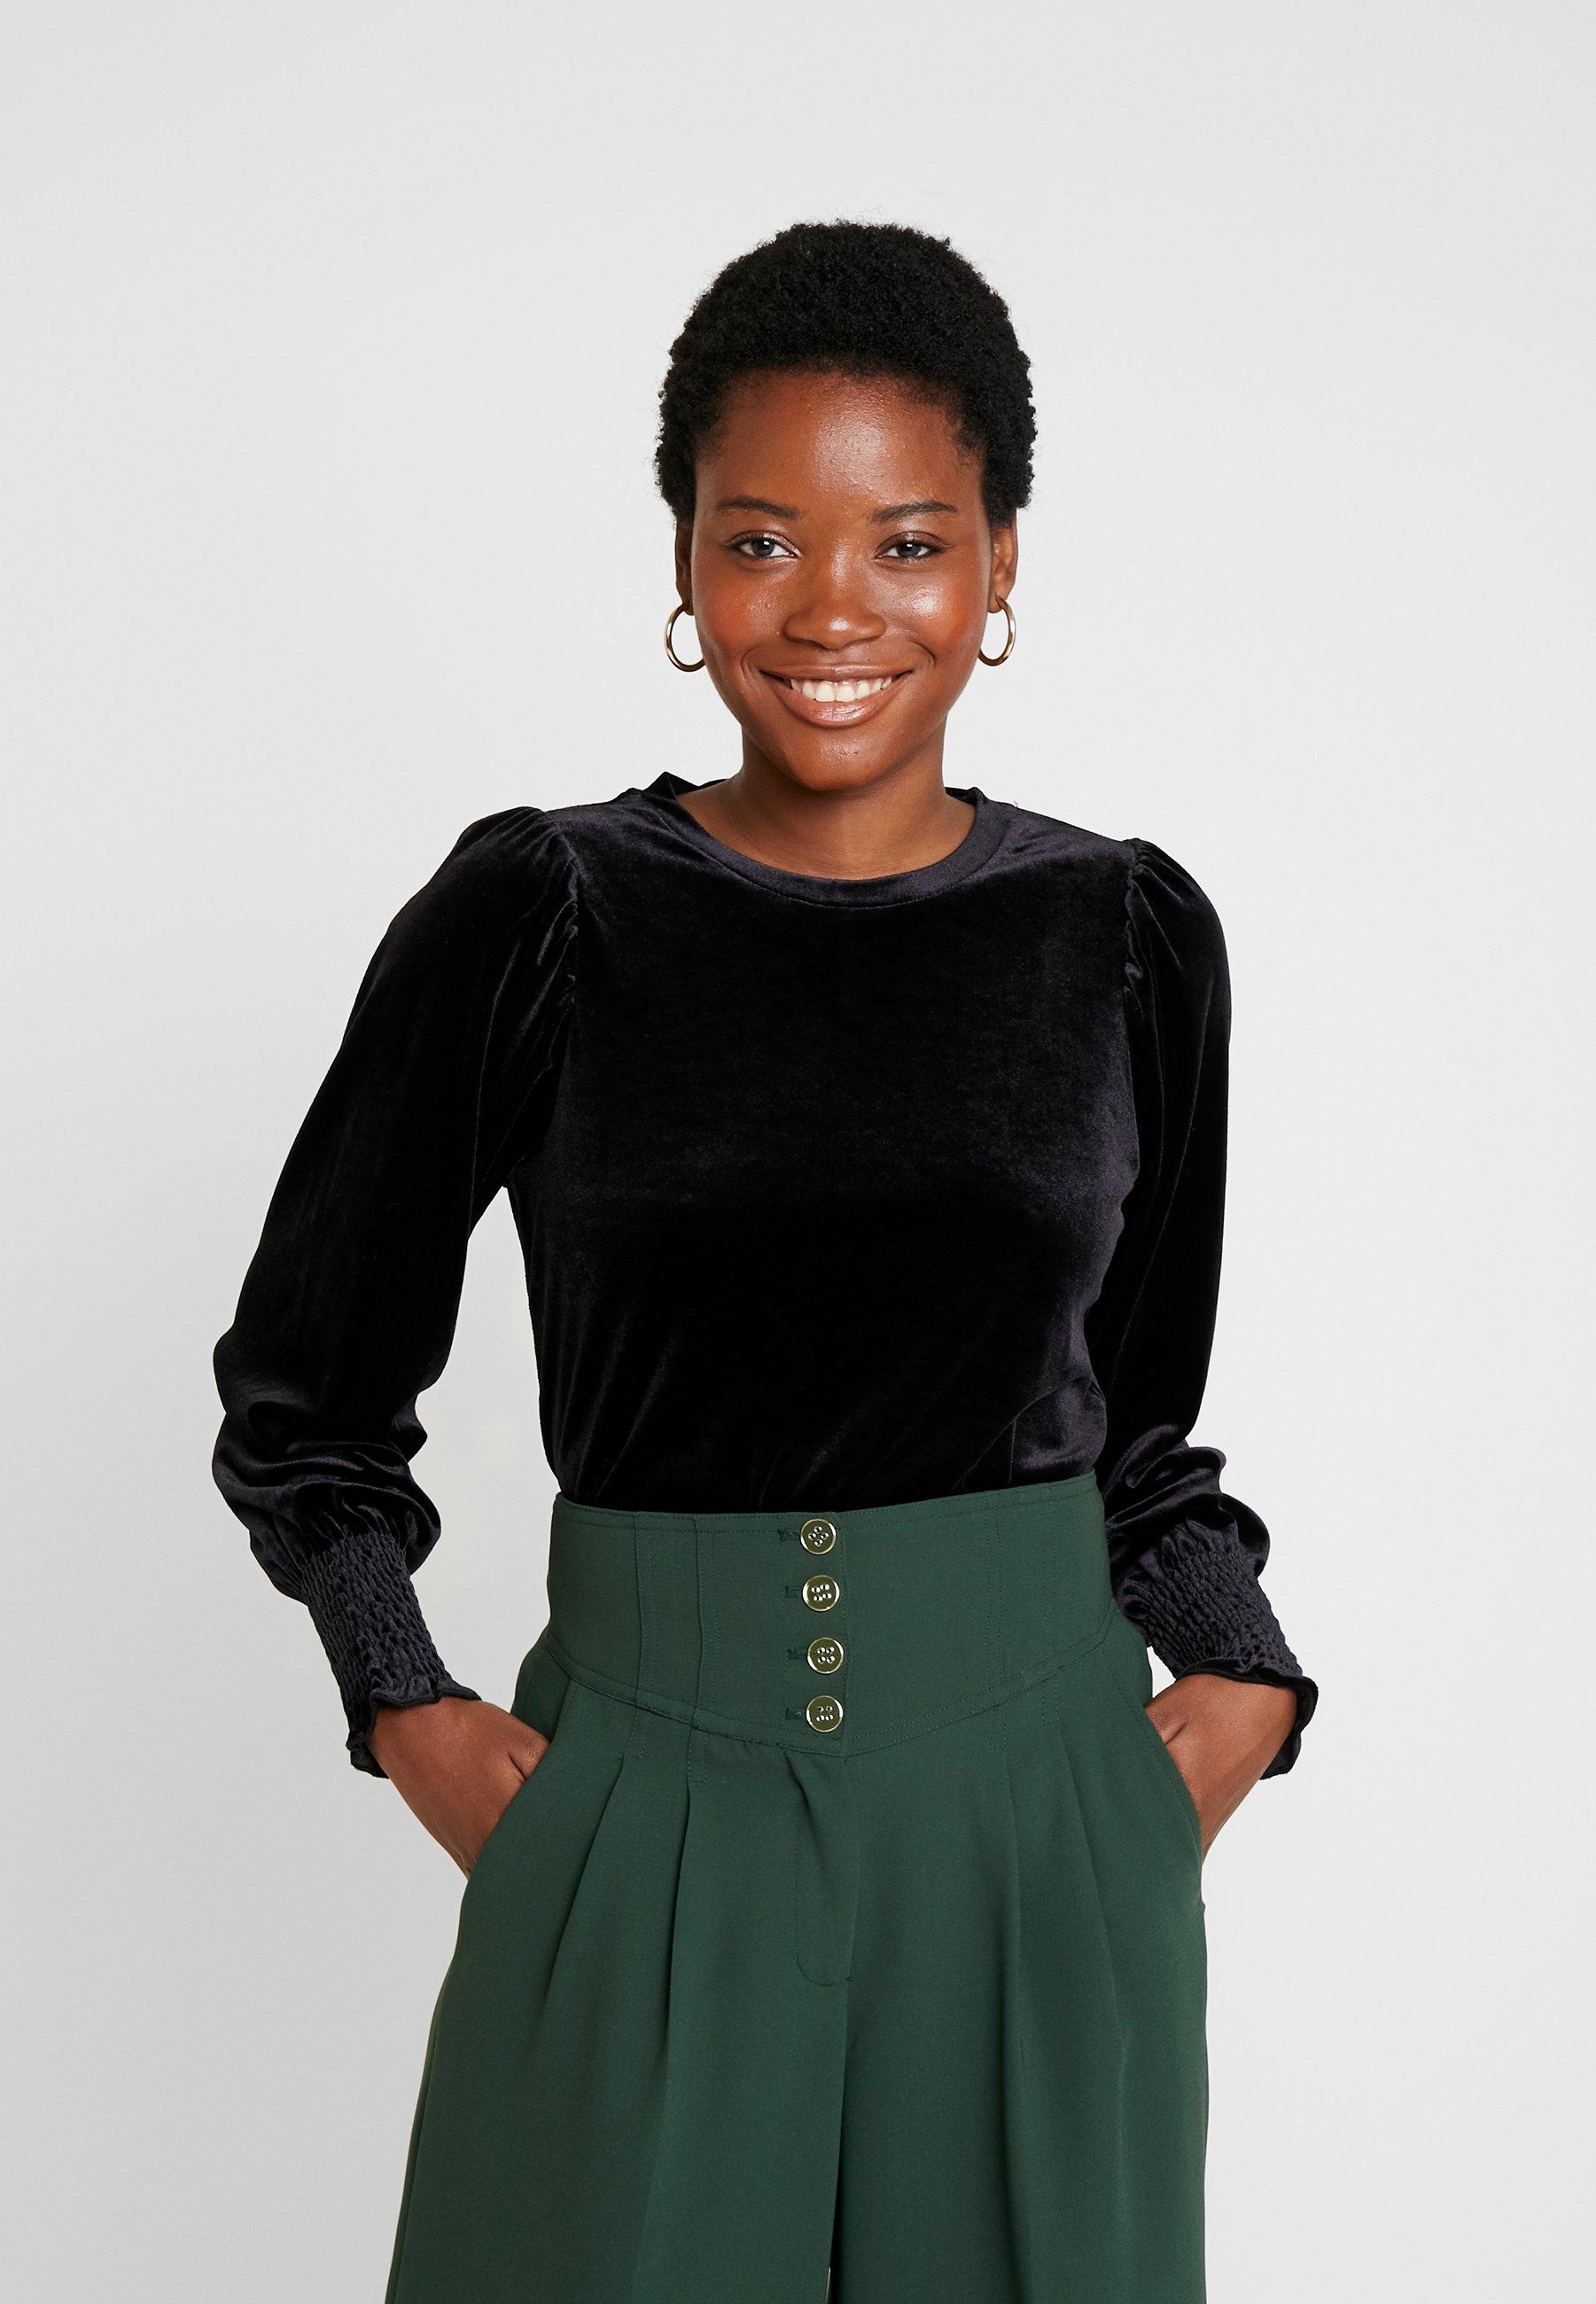 Lunga A OrielMaglietta Manica Inwear Black N80wmn